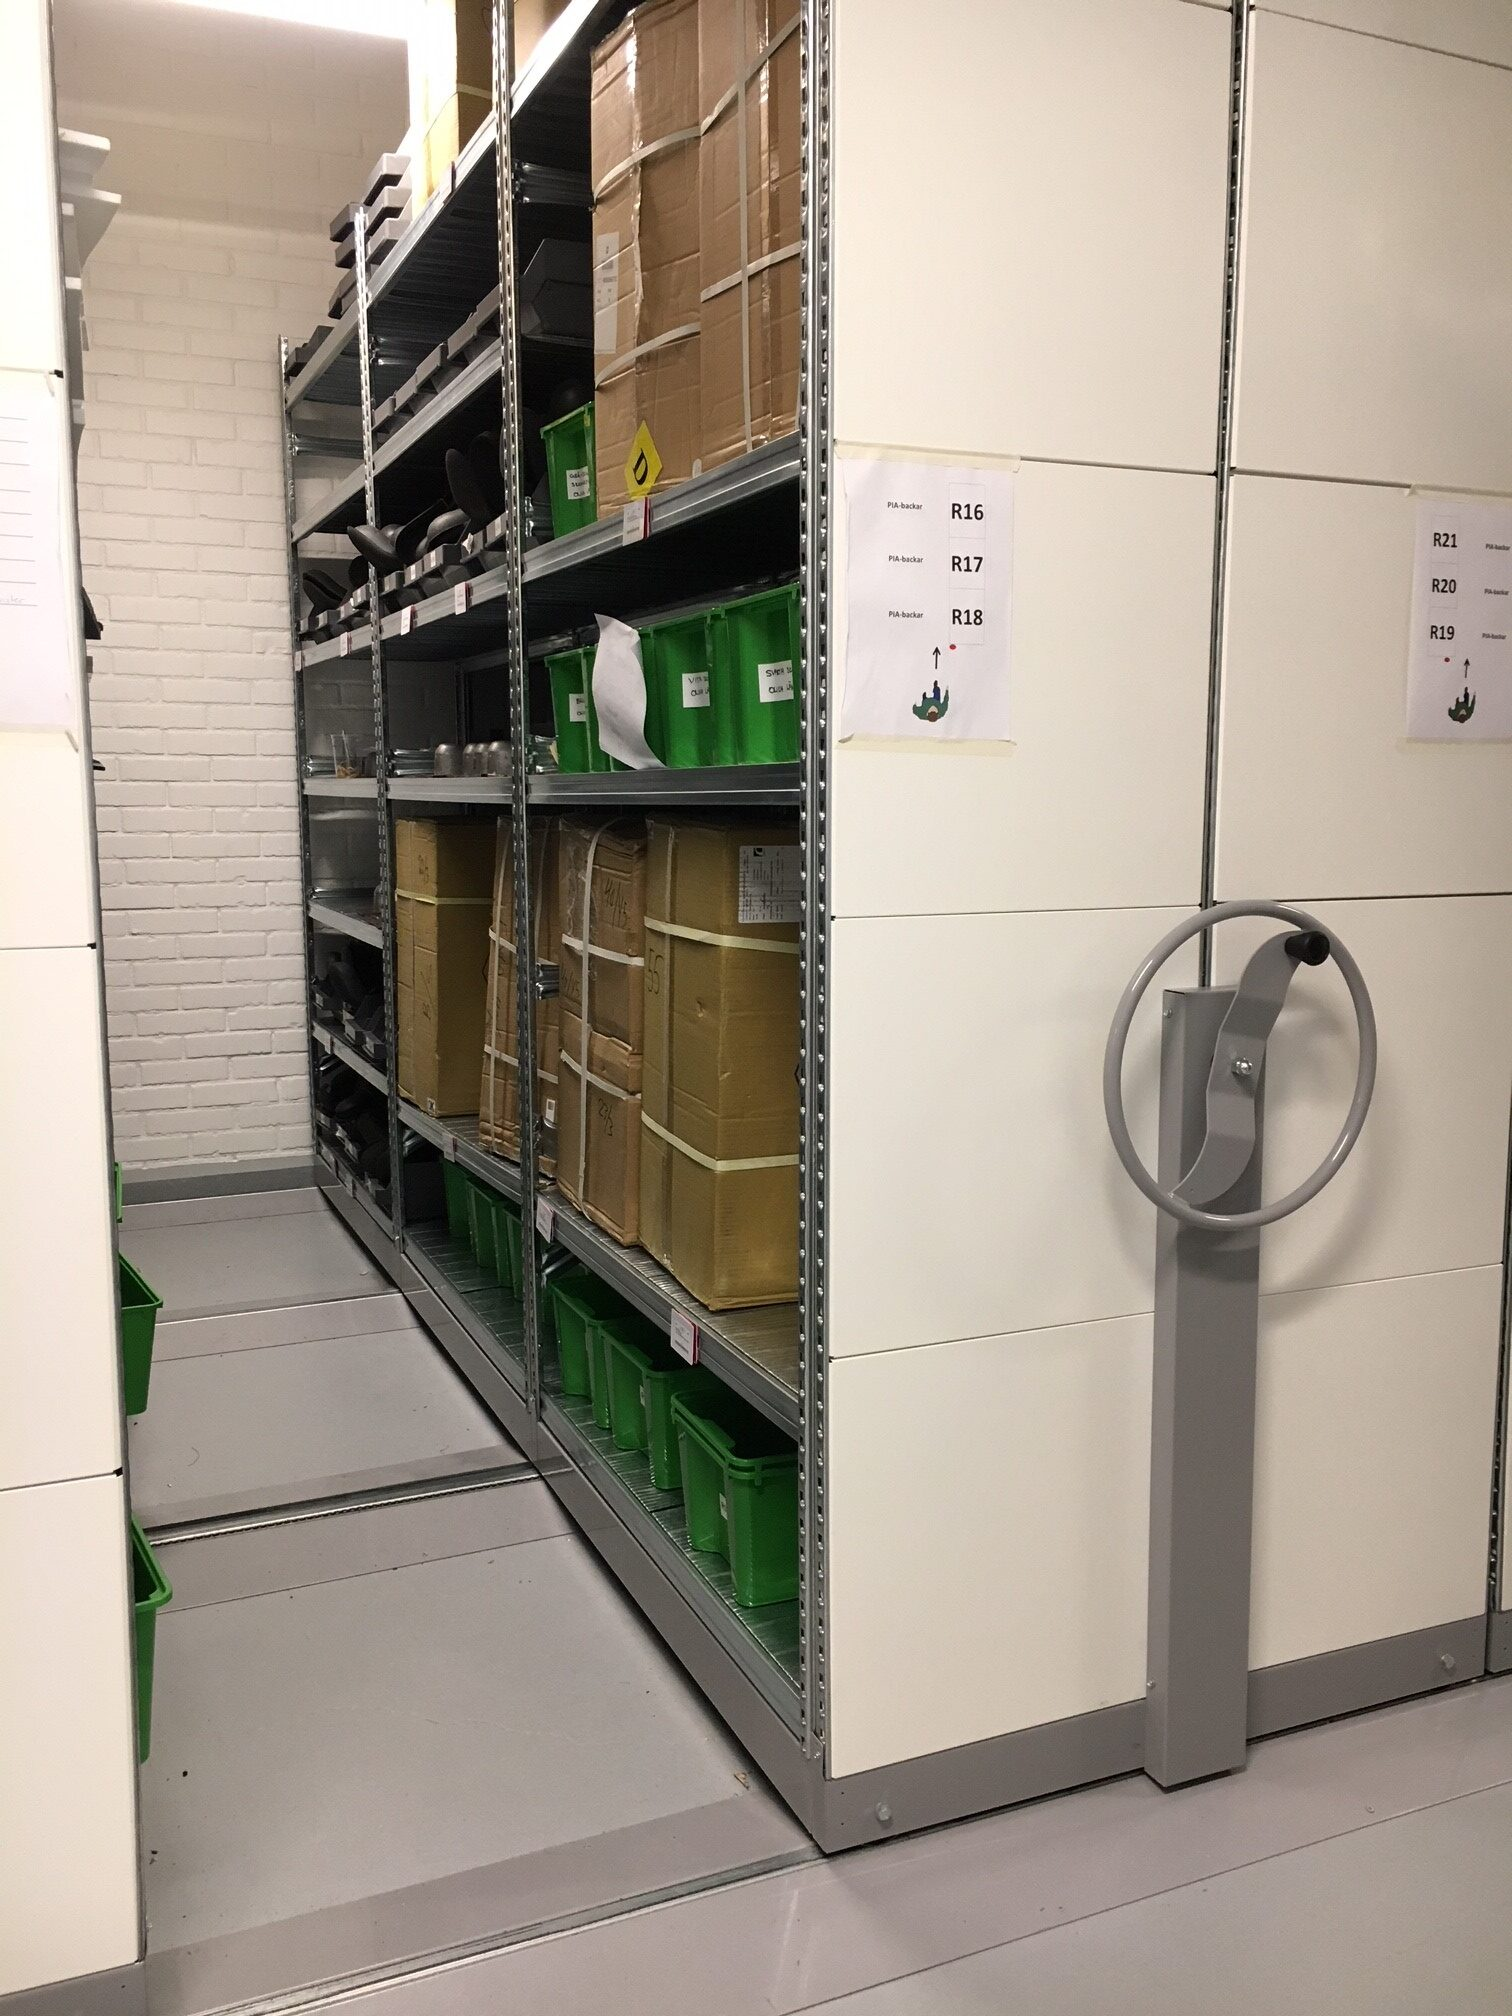 Kompakthylla i industrimiljö